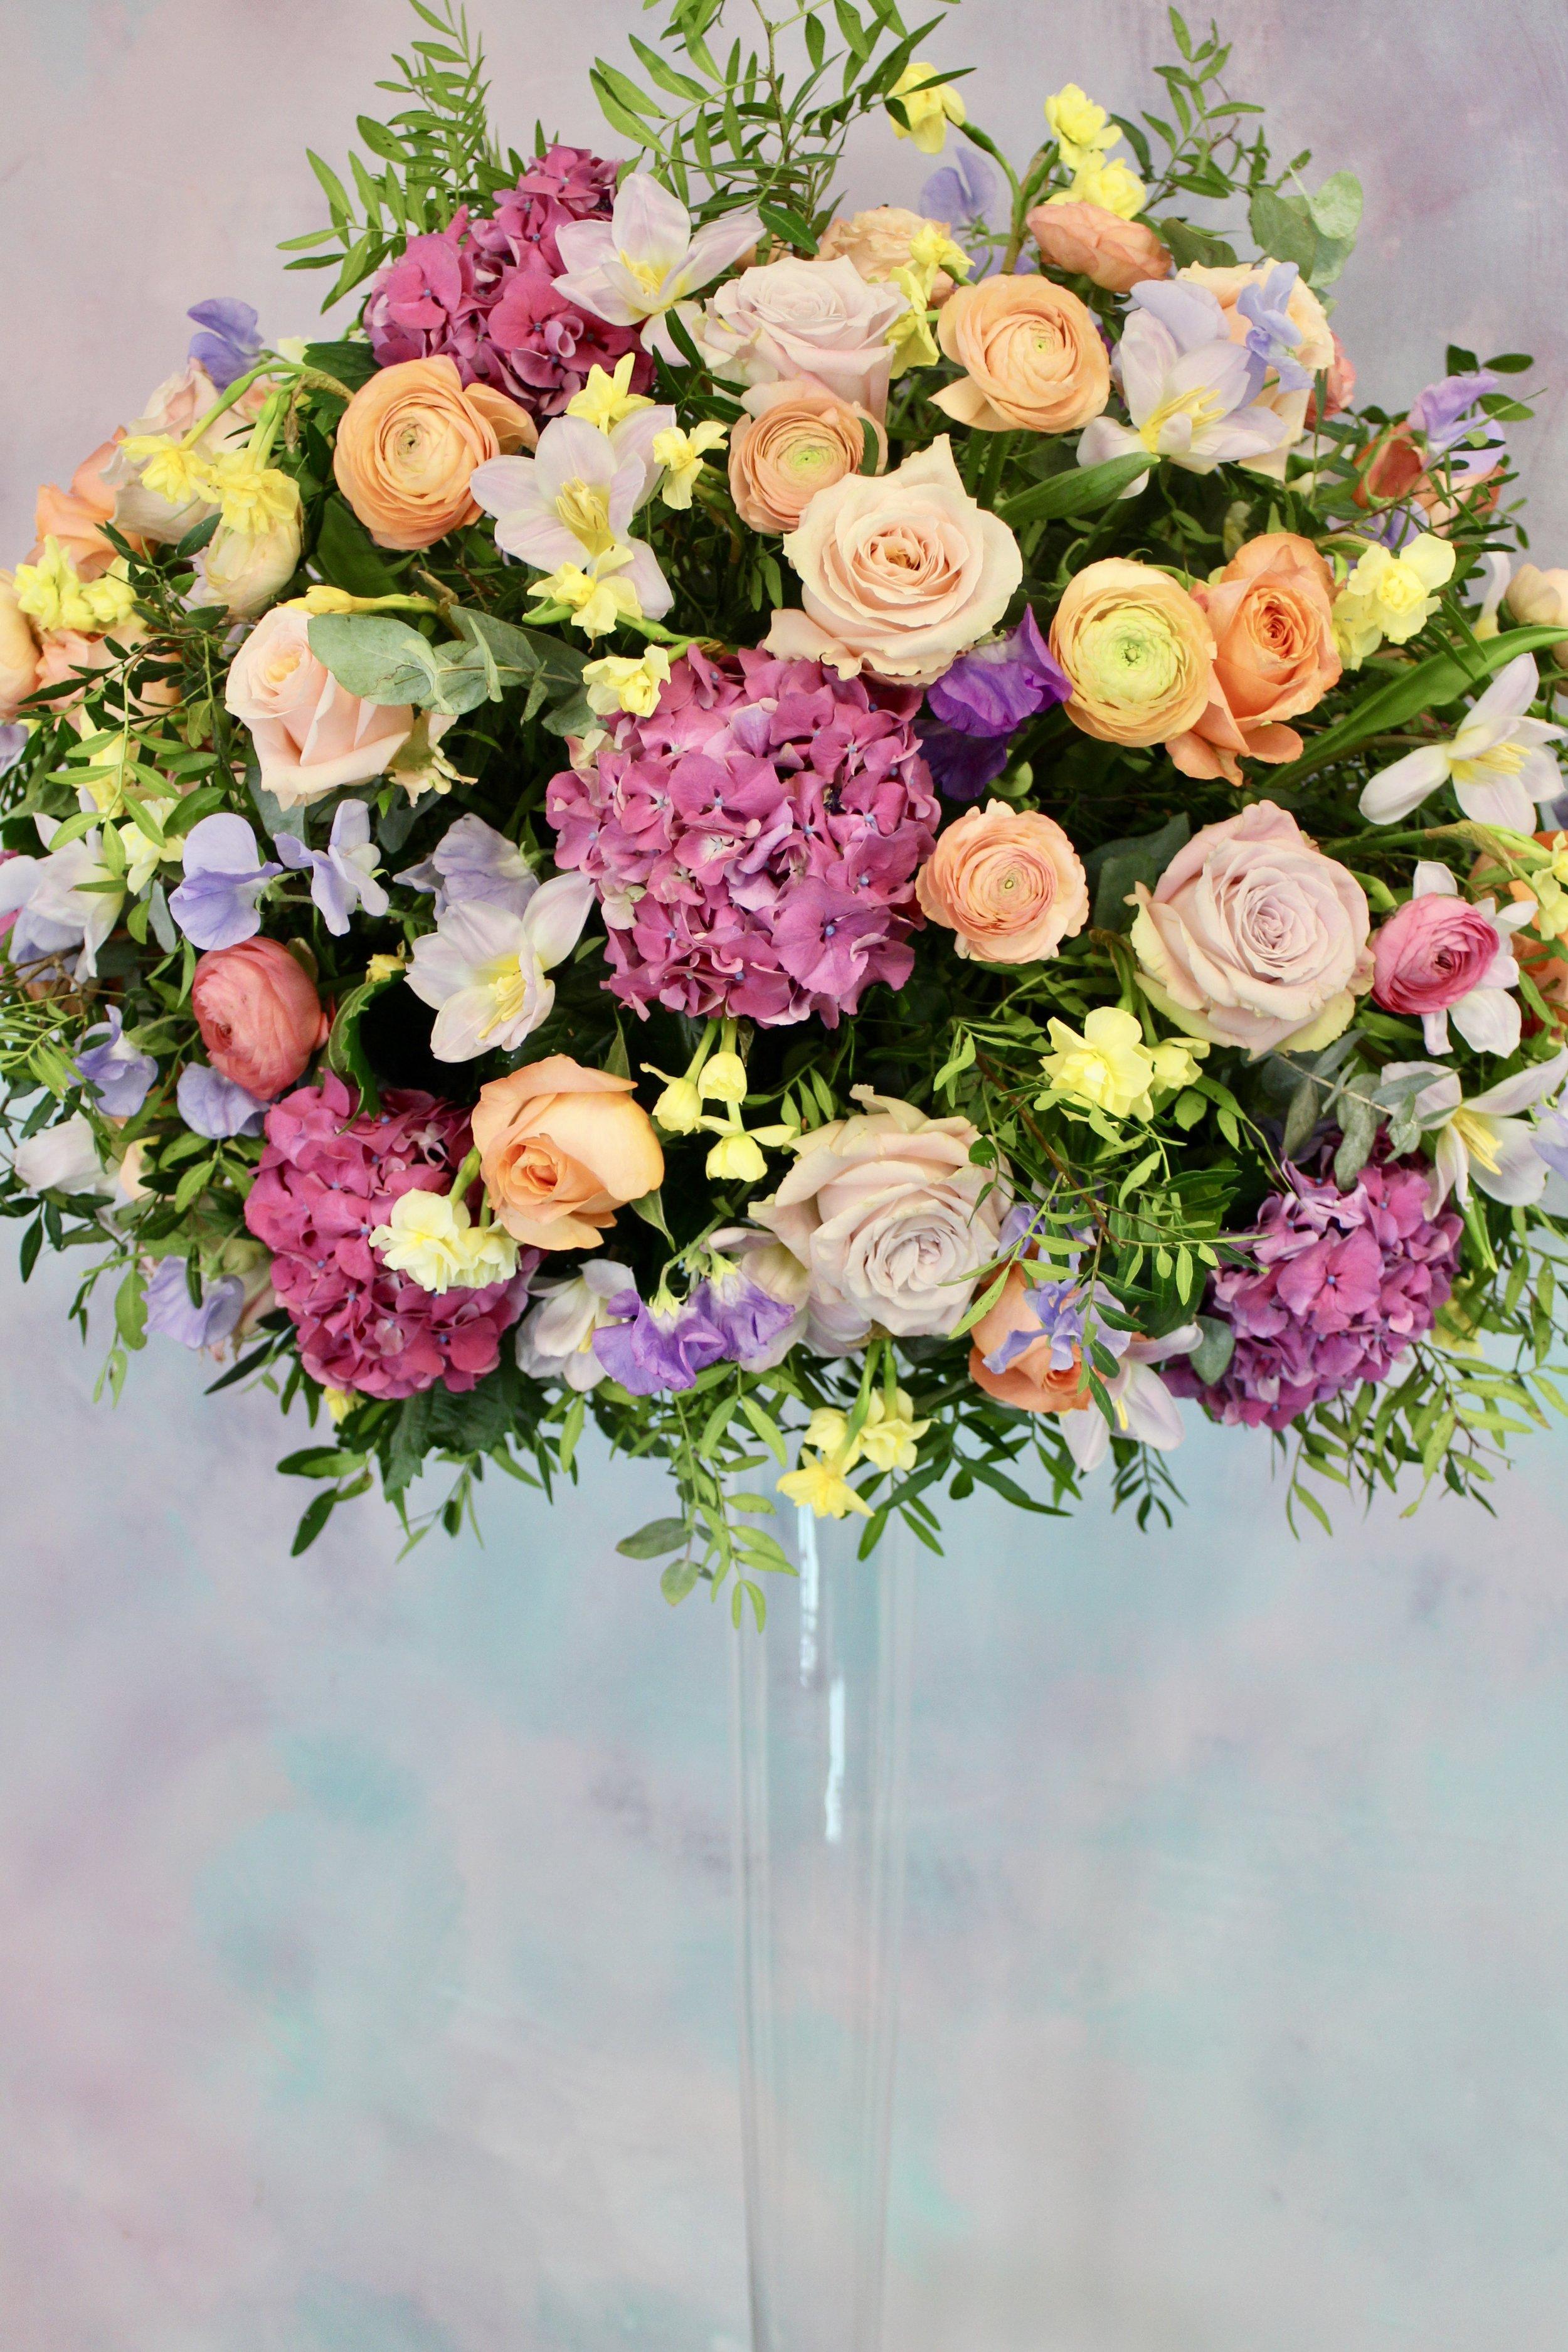 A bride's mock up flowers.